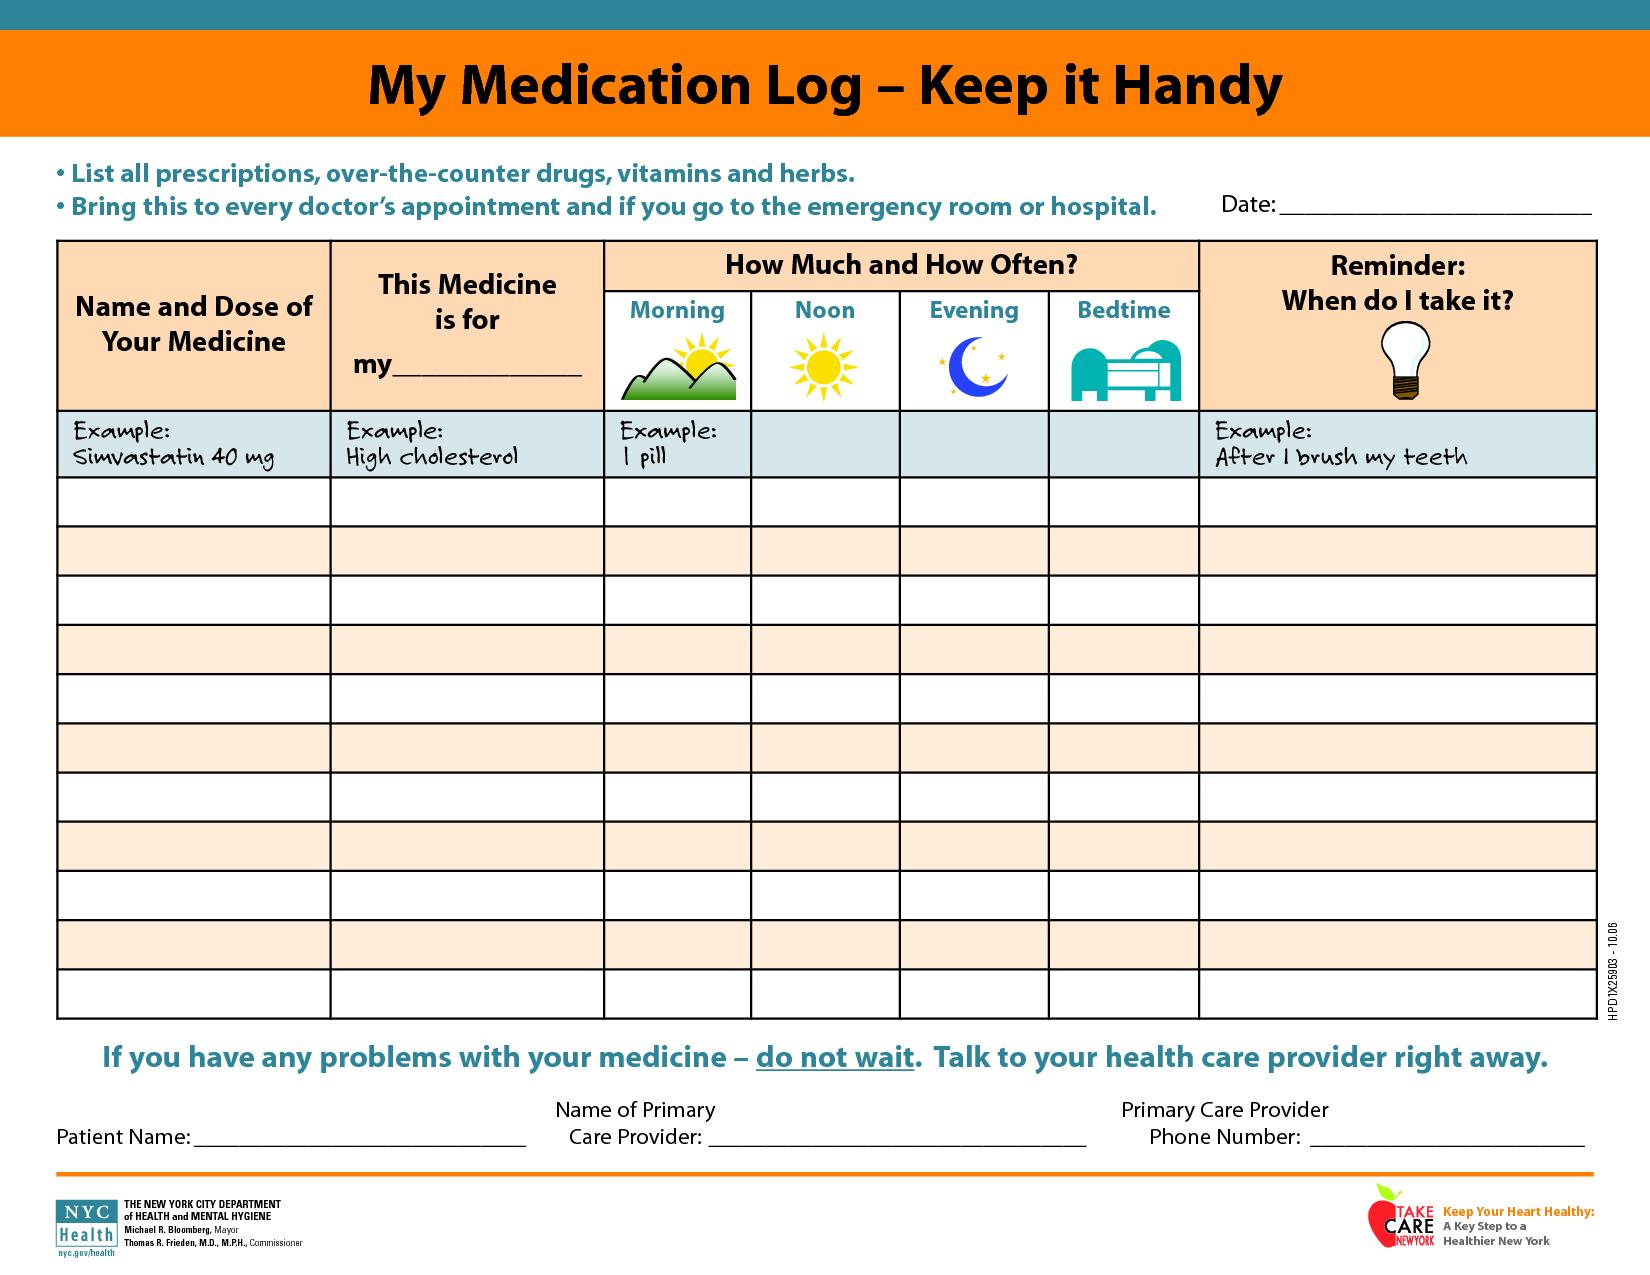 My Medication Log - Keep It Handy | Alternative Medicine | Daily - Free Printable Daily Medication Schedule